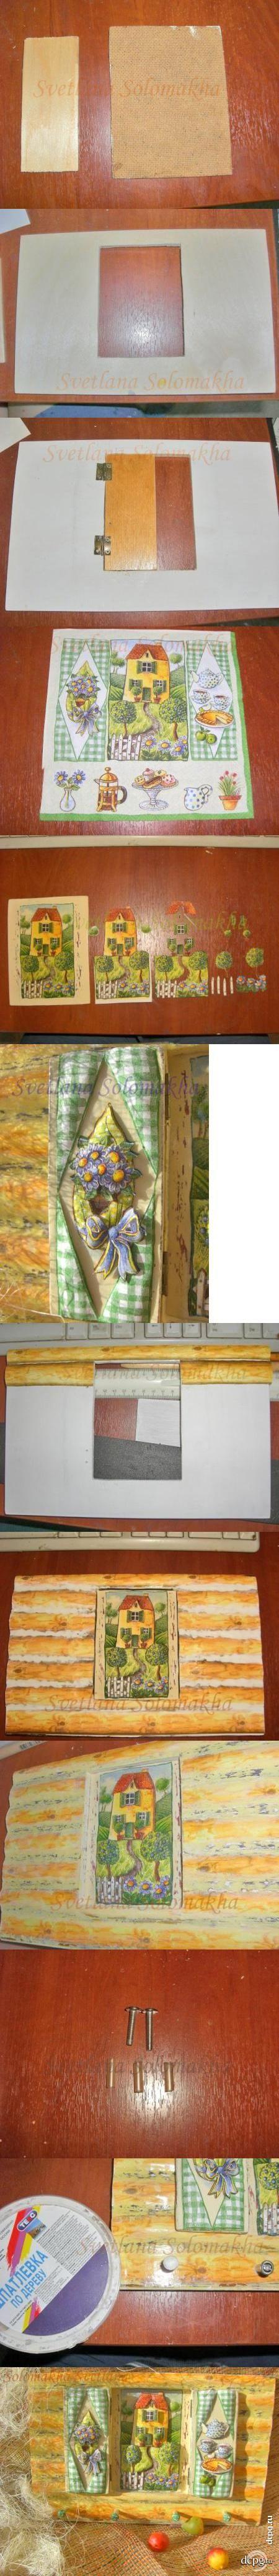 Декупаж - Сайт любителей декупажа - DCPG.RU | Делаем объемное панно-ключницу Click on photo to see more! Нажмите на фото чтобы увидеть больше!  decoupage art craft handmade home decor DIY do it yourself tutorial Materials and techniques: napkins prints acrylic paint varnish etc.